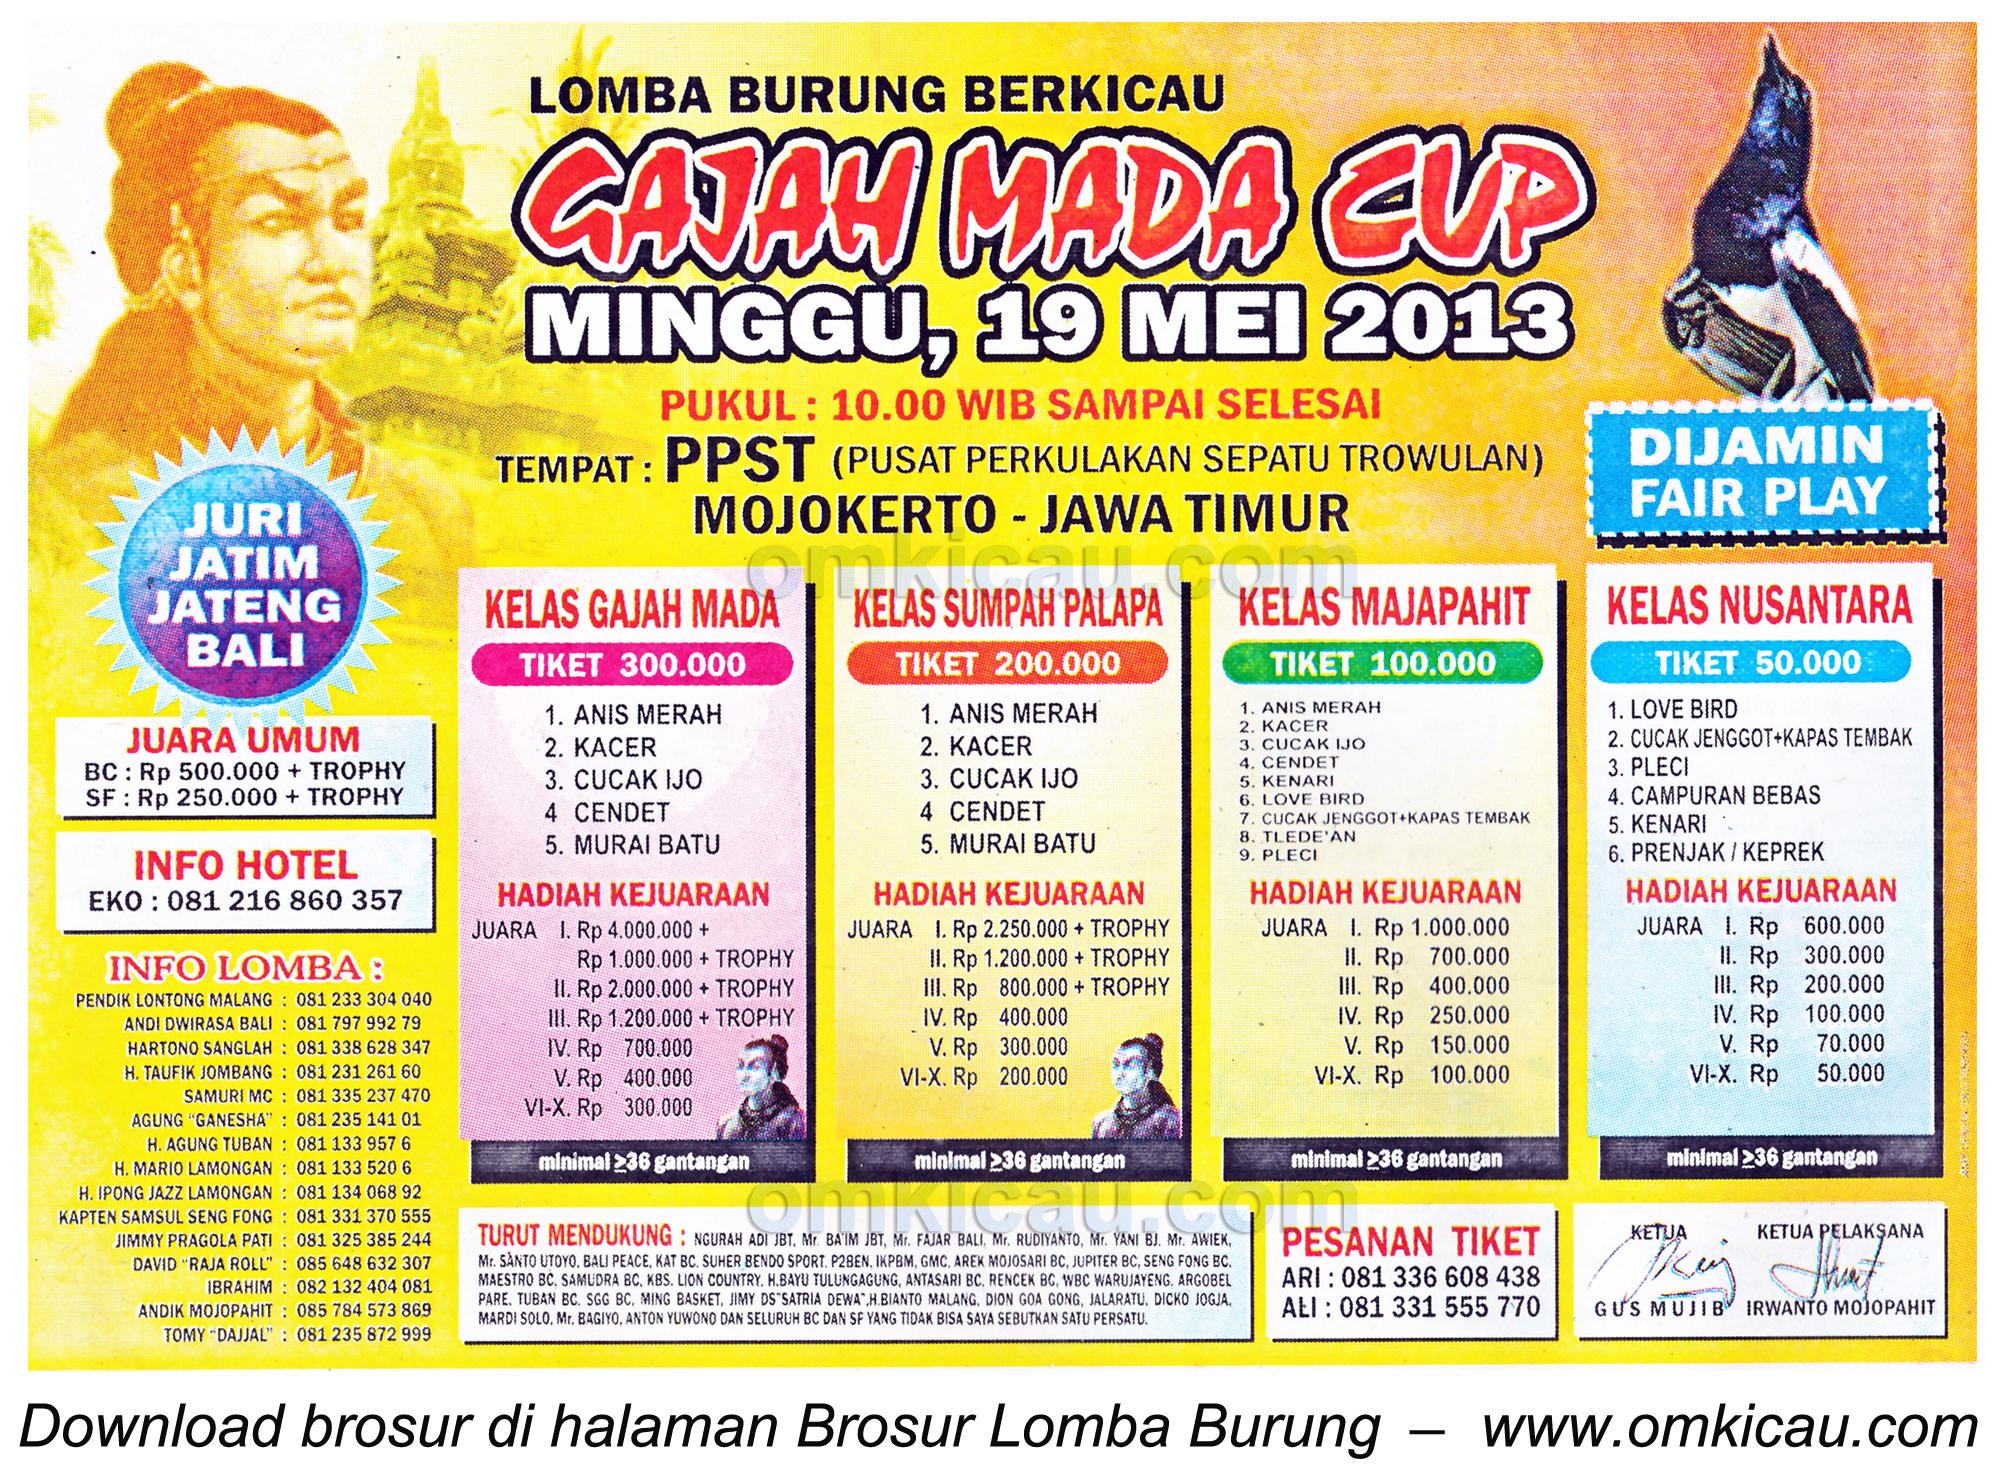 Brosur Lomba Burung Gajahmada Cup - Mojokerto - 19 Mei 2013